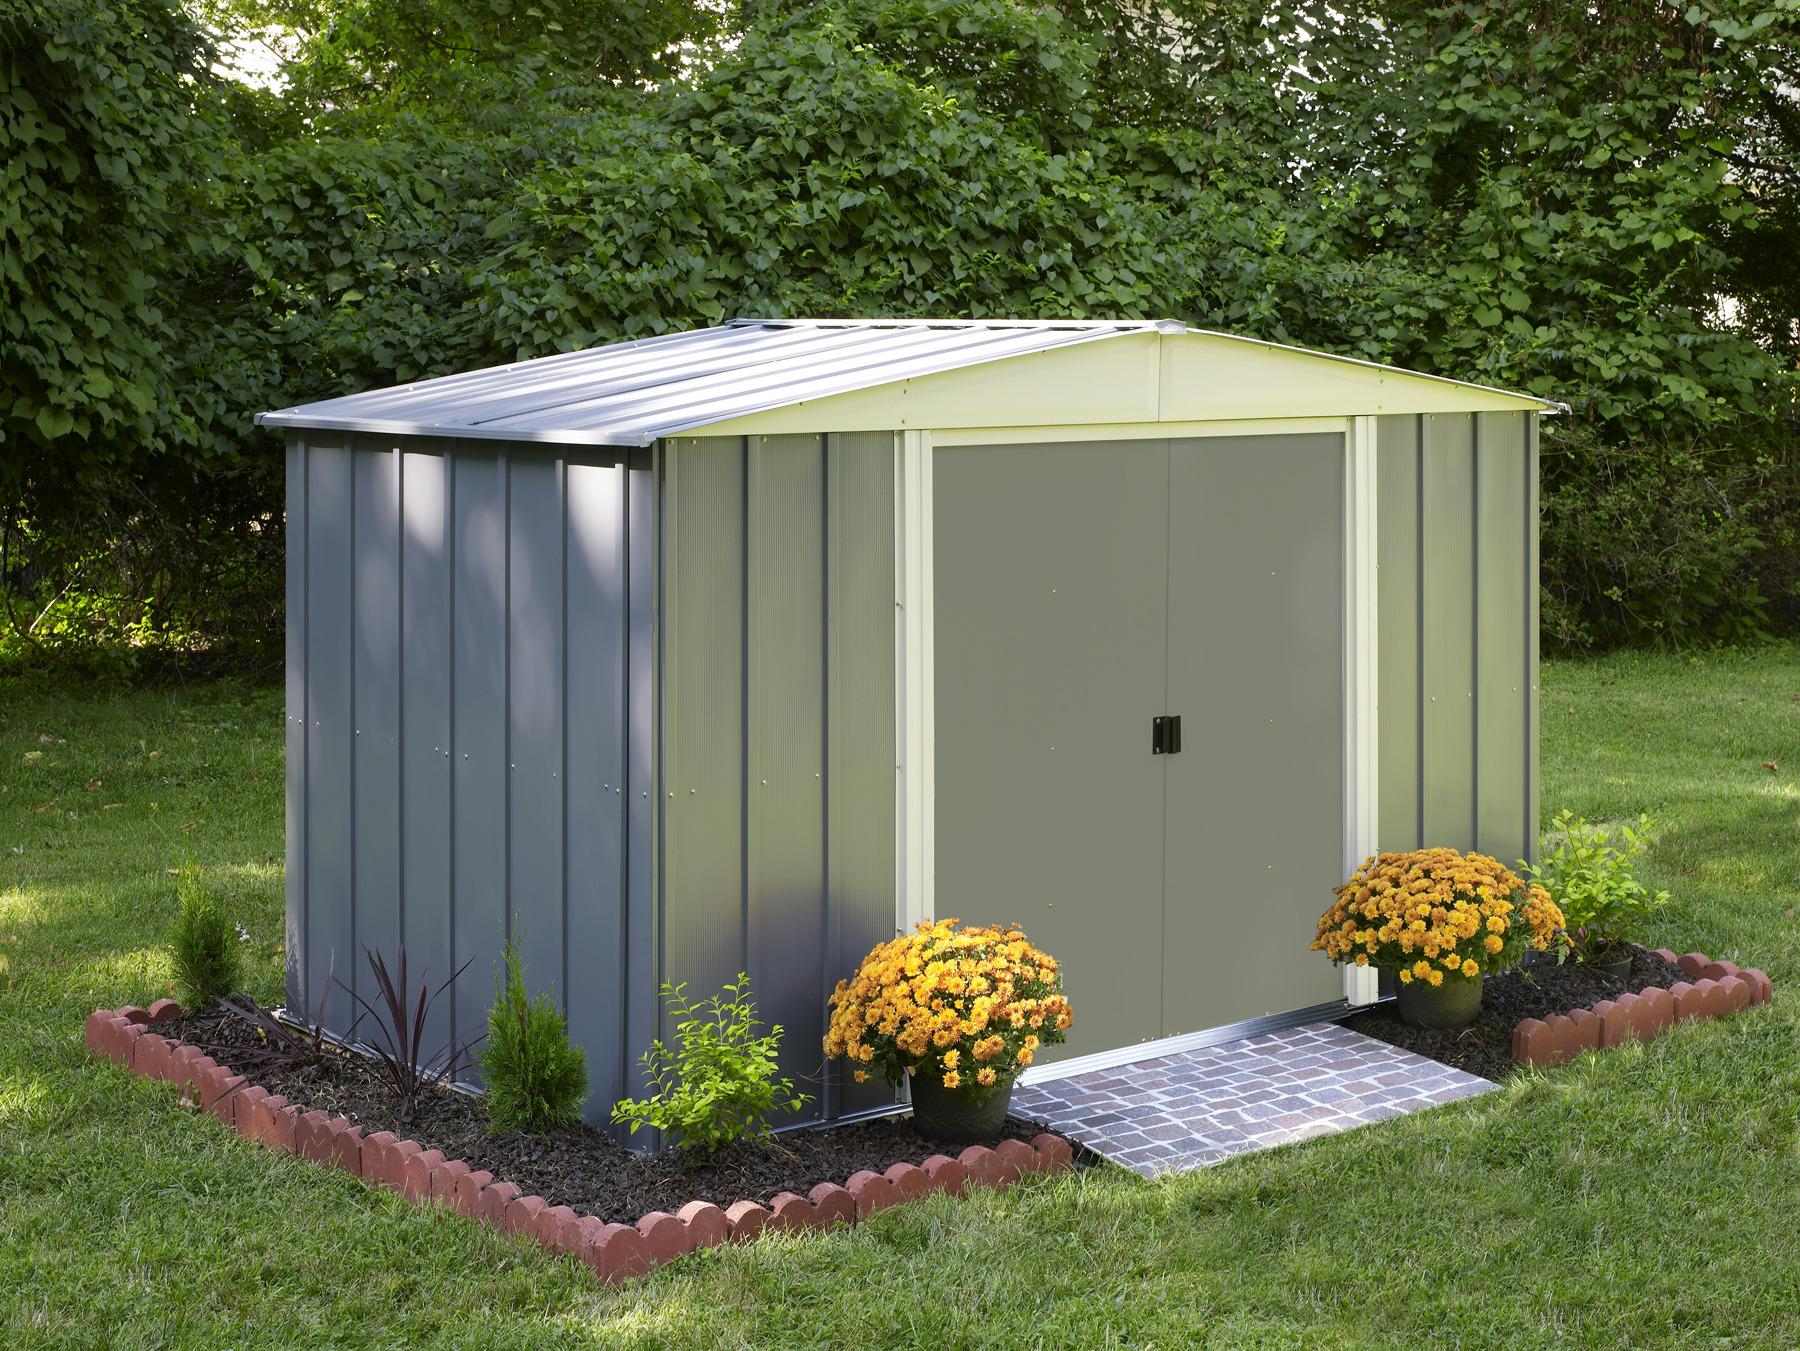 abri de jardin en acier lm 106 arrow cabanes de jardin accessoires abris de jardin. Black Bedroom Furniture Sets. Home Design Ideas